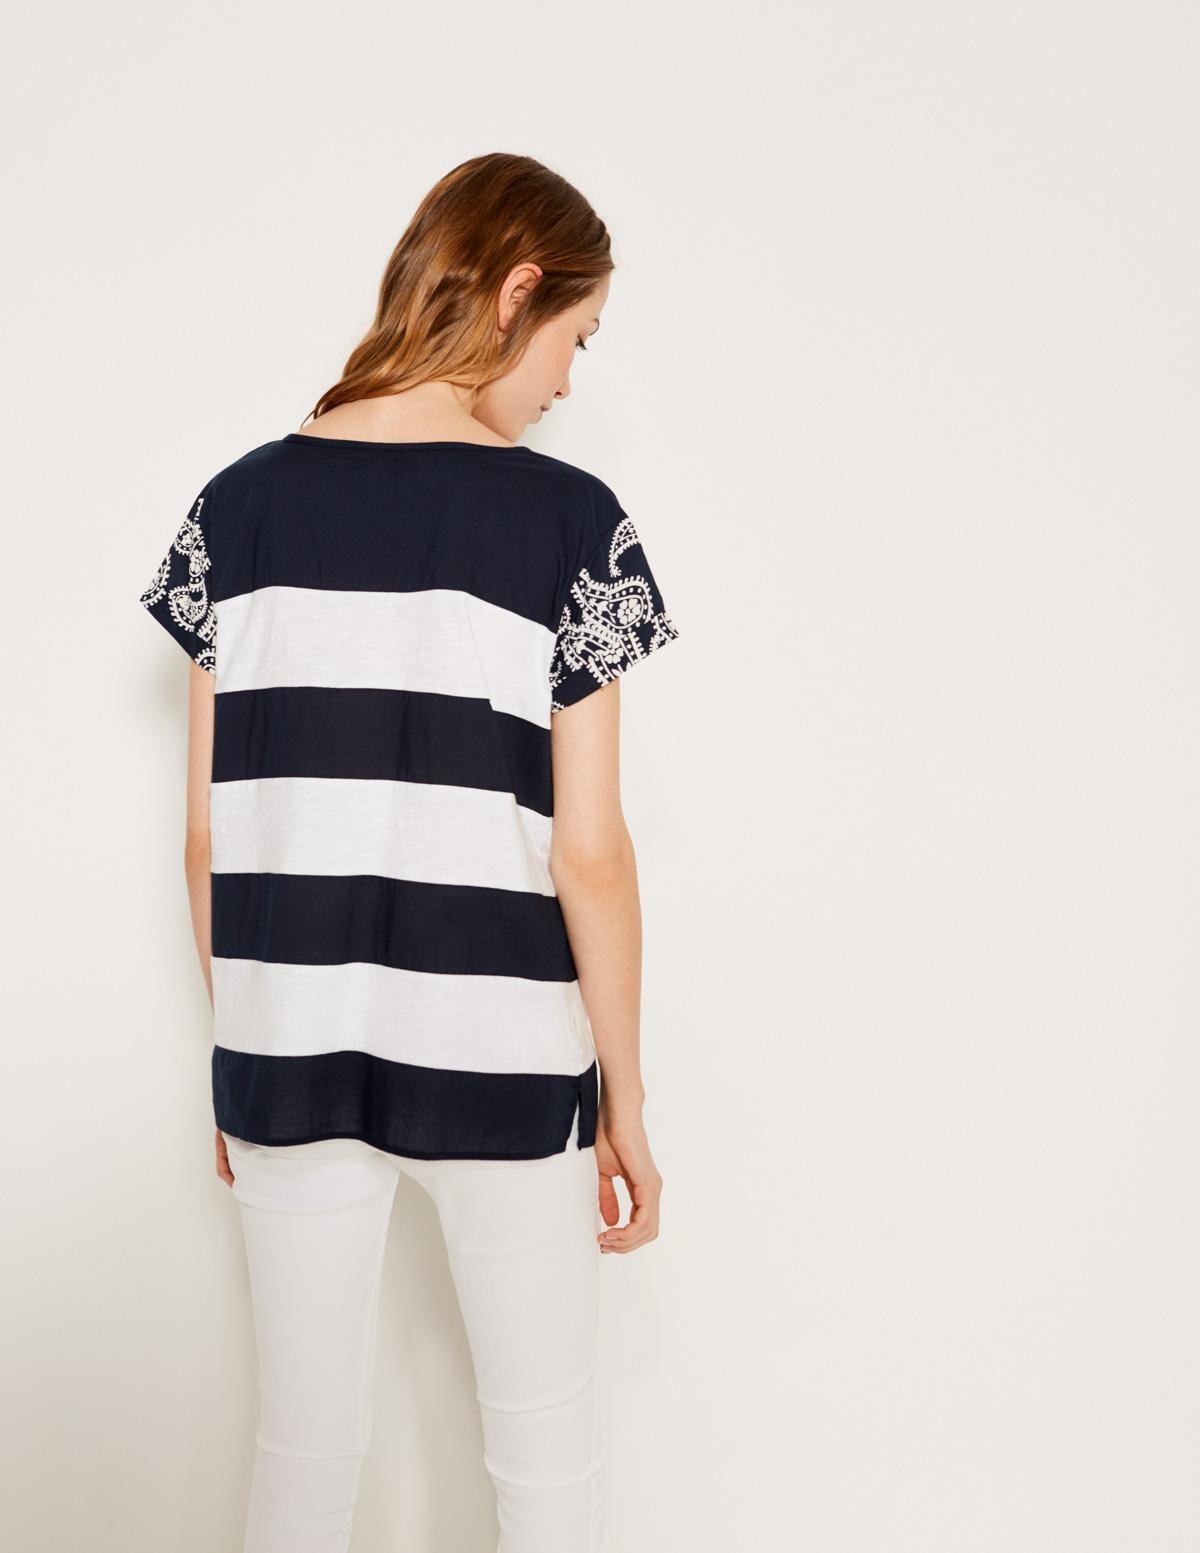 Camiseta mangas contraste - Ítem2